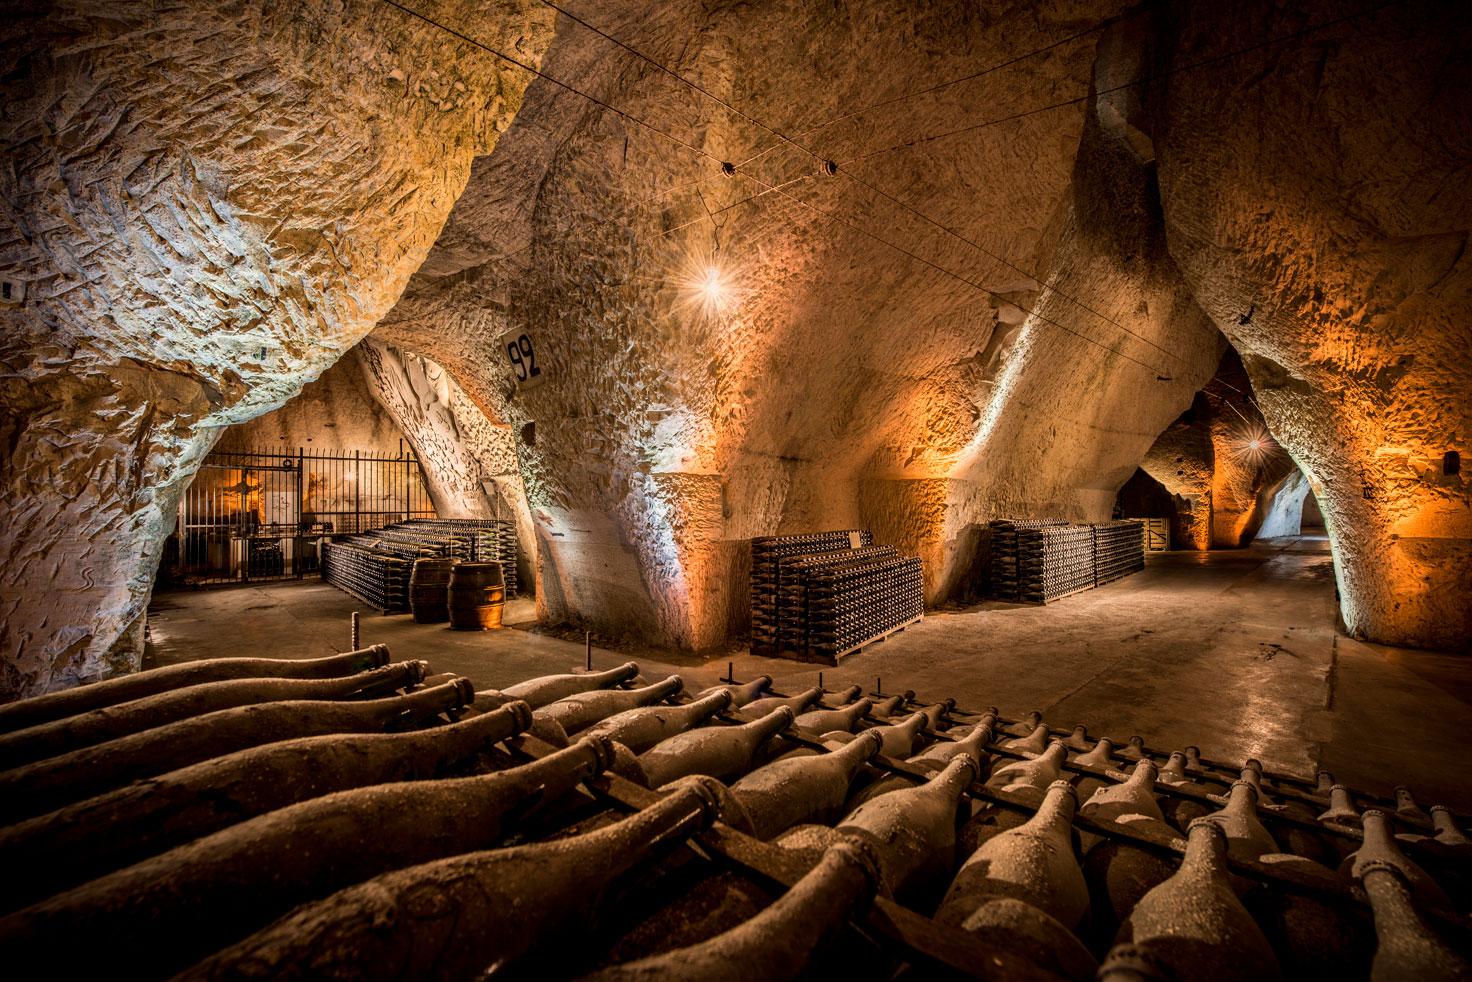 Bodegas Veuve Clicquot Patrimonio de la Humanidad